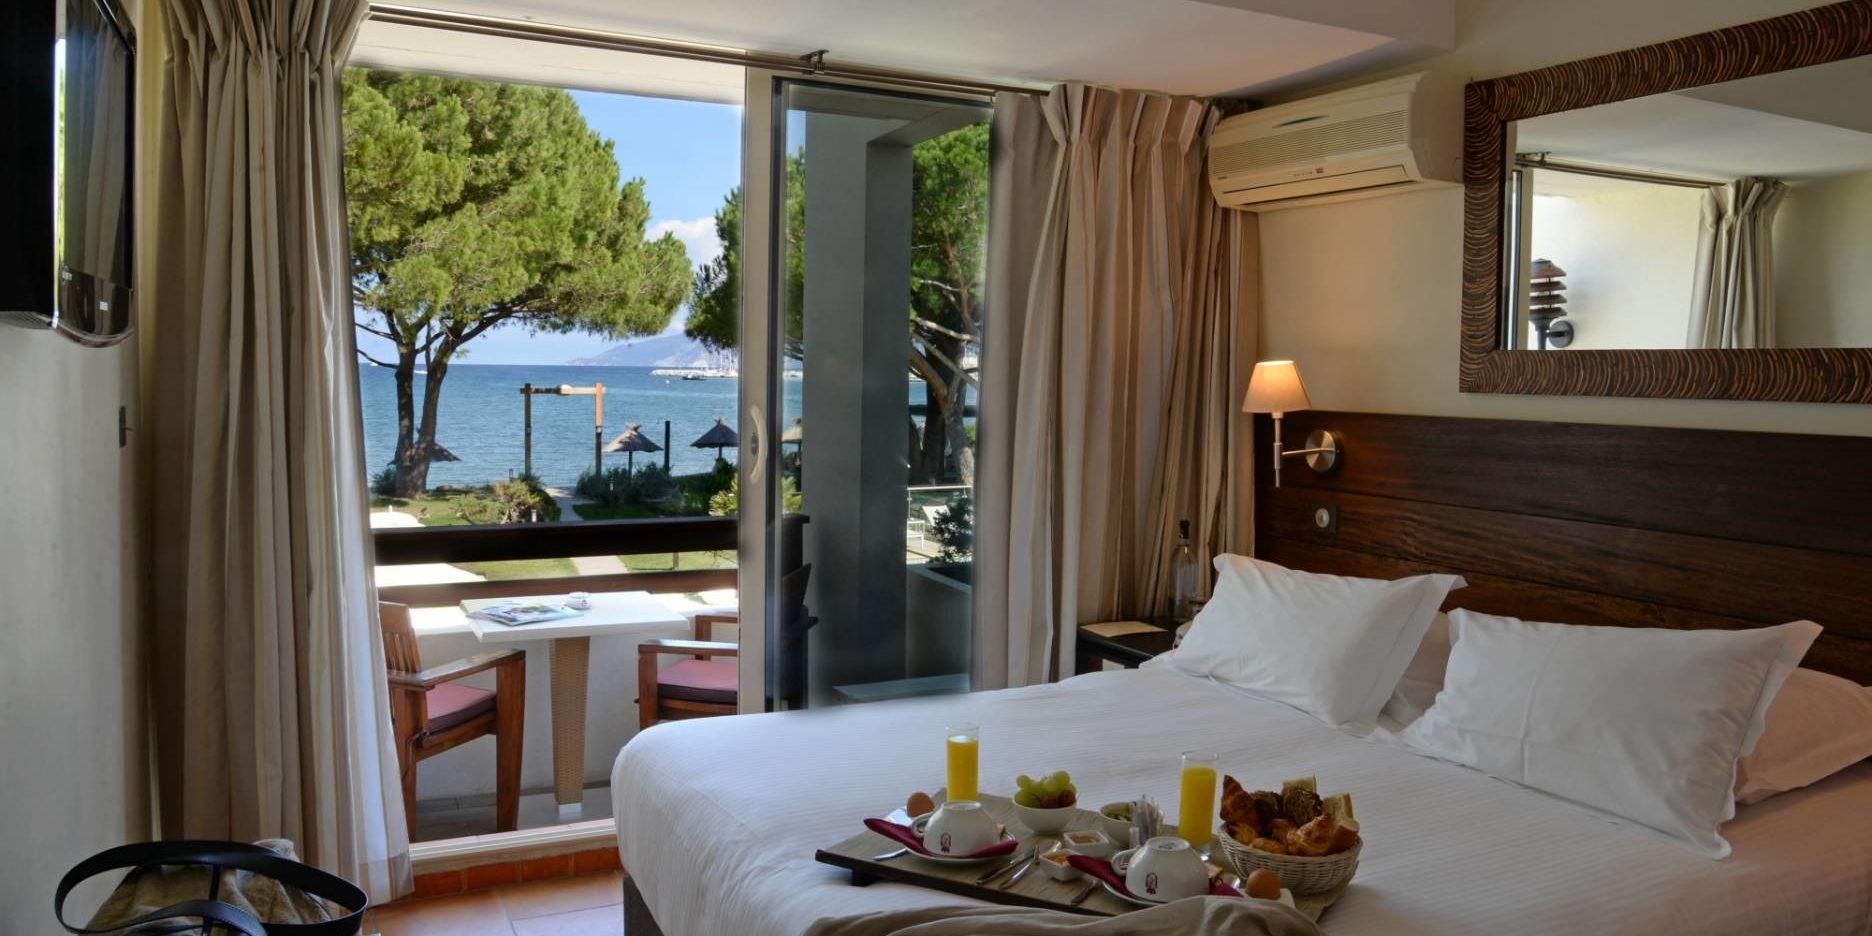 Hotel La Roya Saint-Florent Corsica Frankrijk kamer-Superieure tweepersoonsbed balkon zeezicht